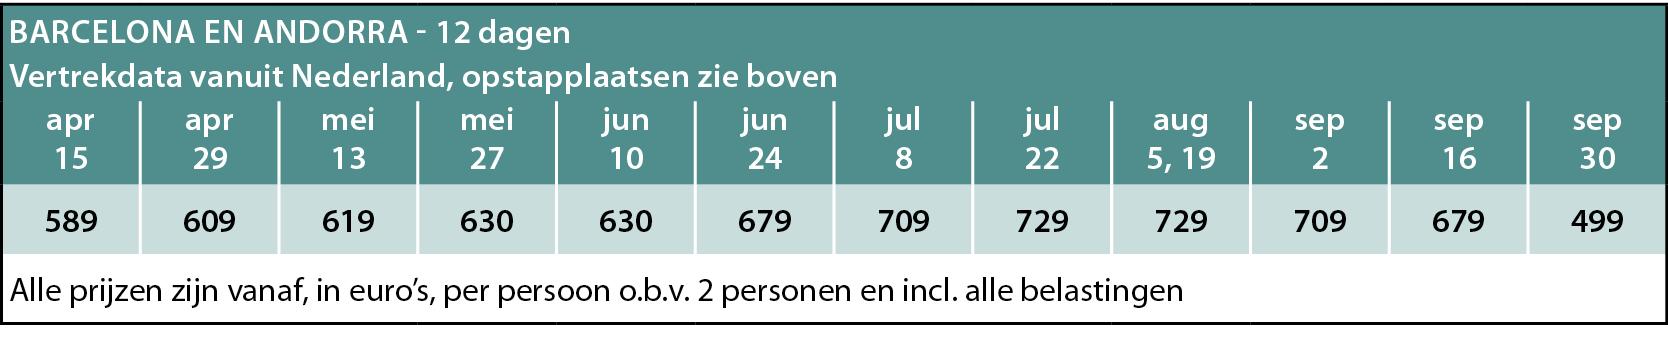 Prices-Barcelona-Andorra-2019